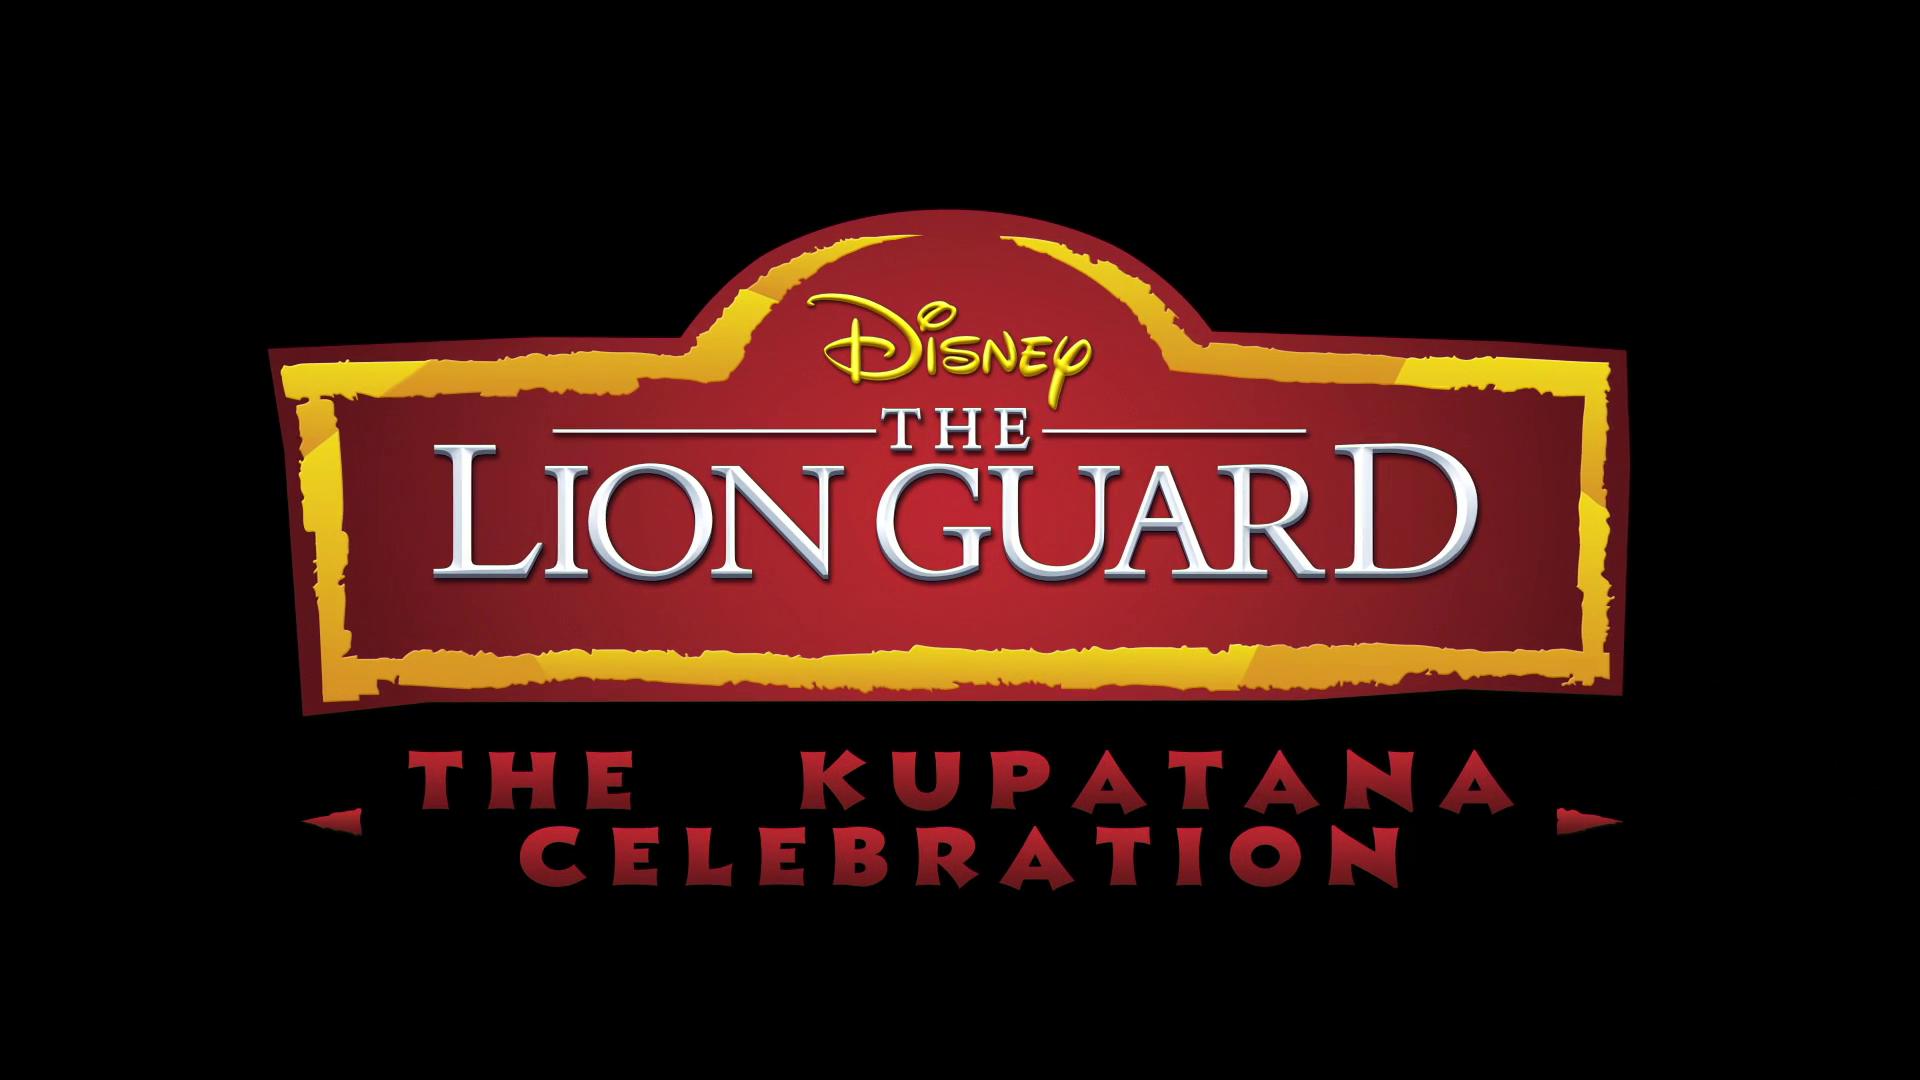 The Kupatana Celebration